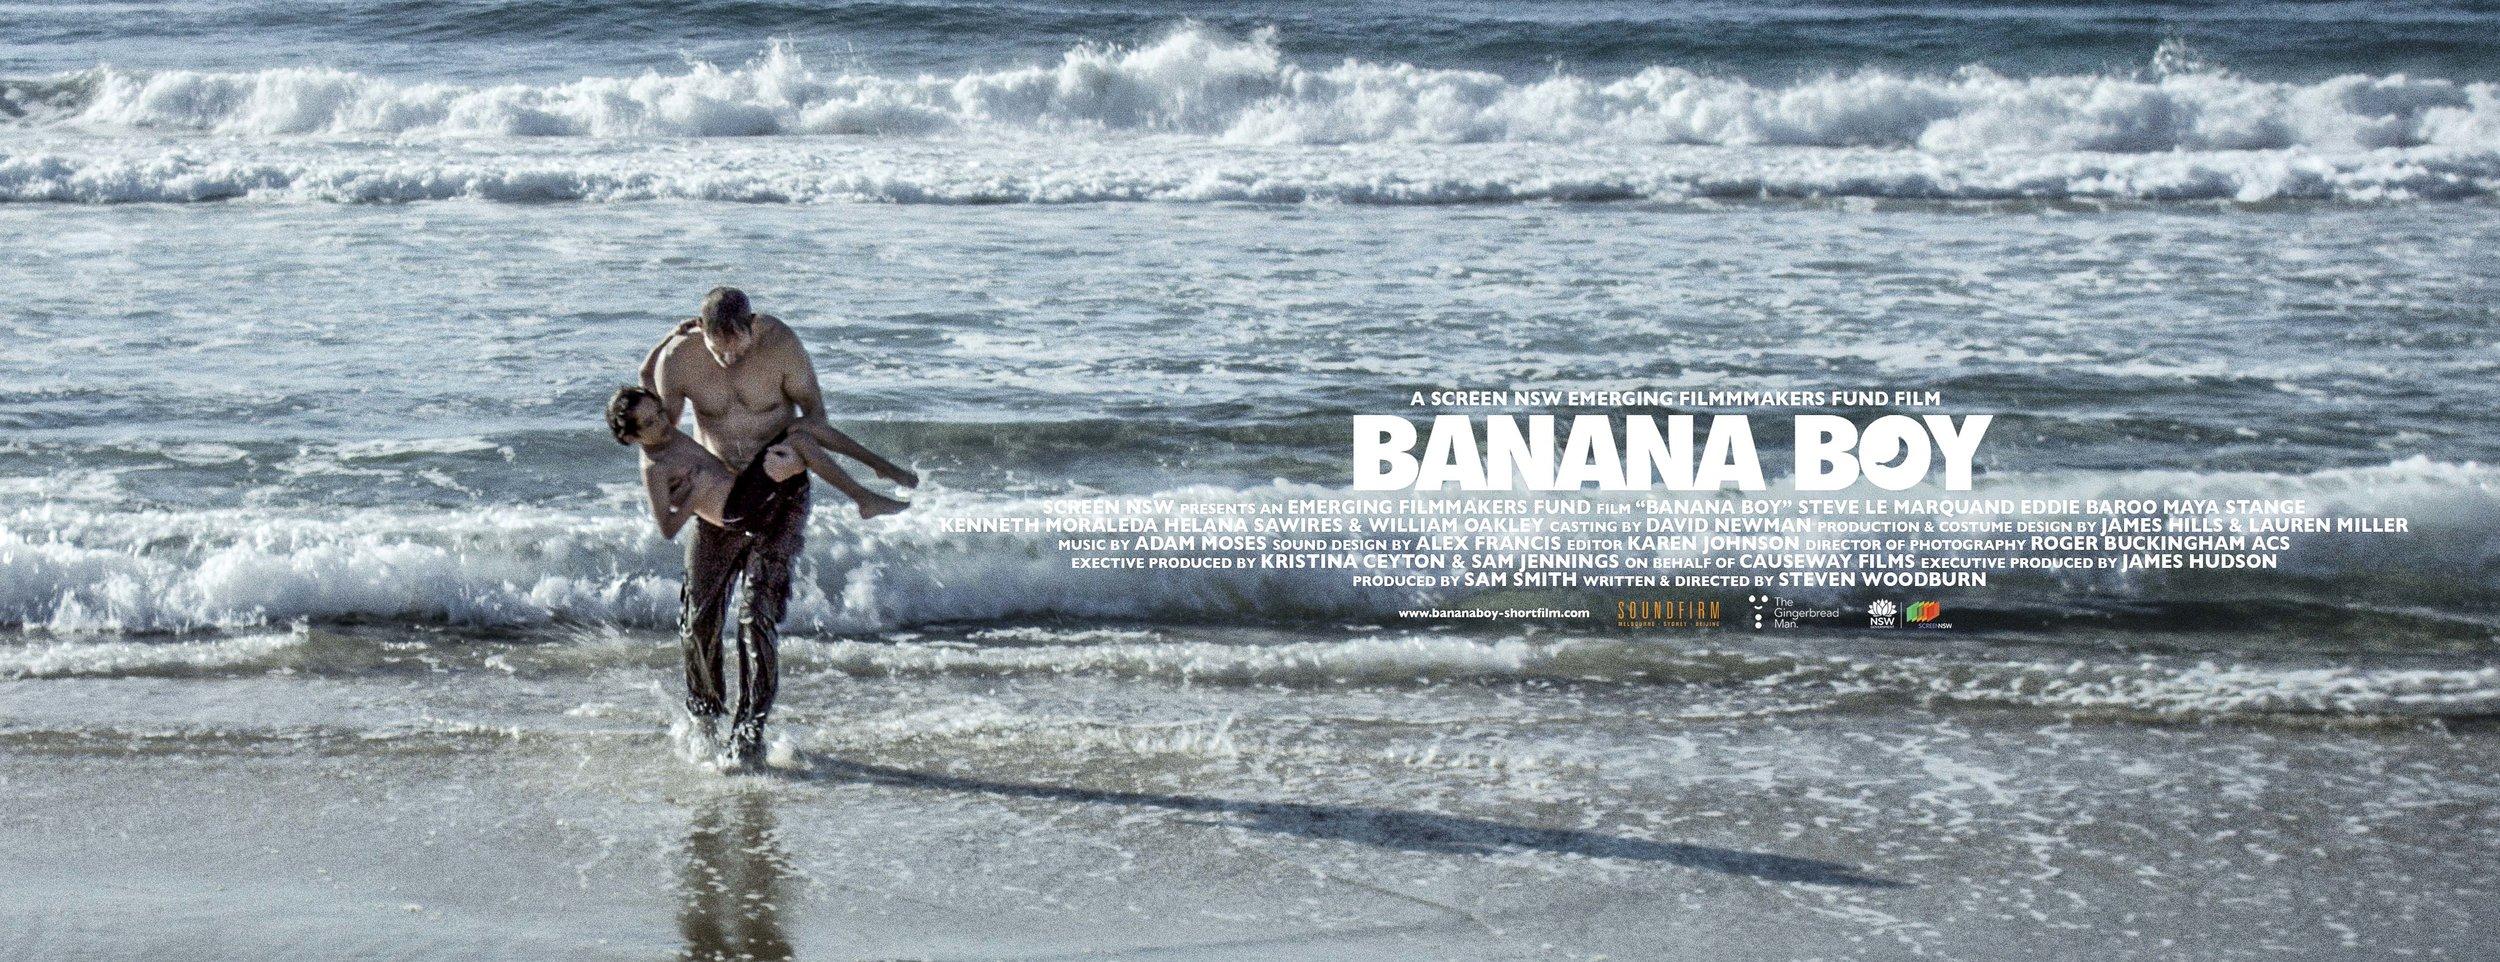 Banana Boy Cover Photo PSD2.jpg